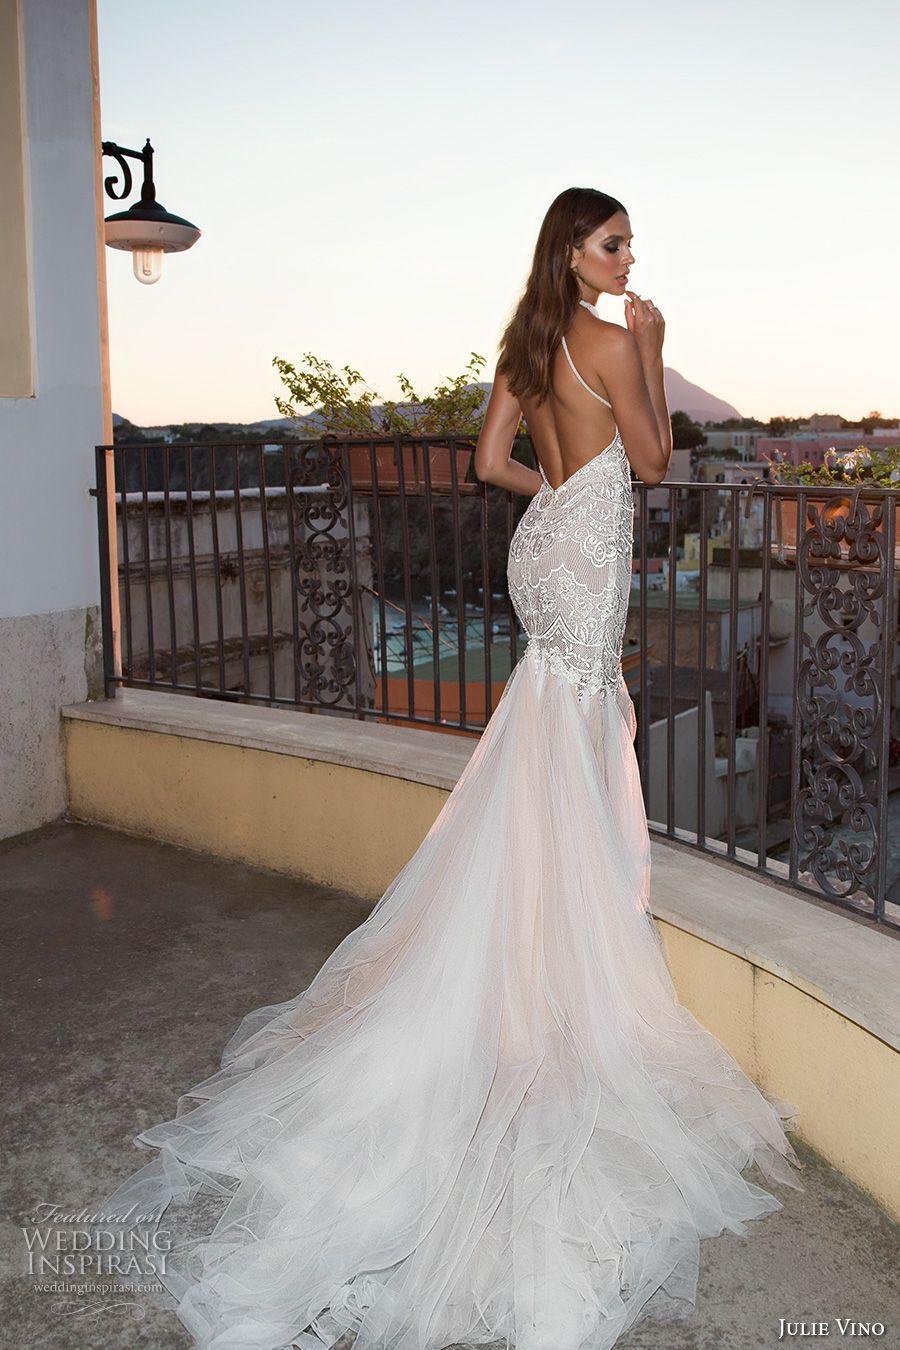 Julie vino fall wedding dresses u ucnapoliud bridal collection